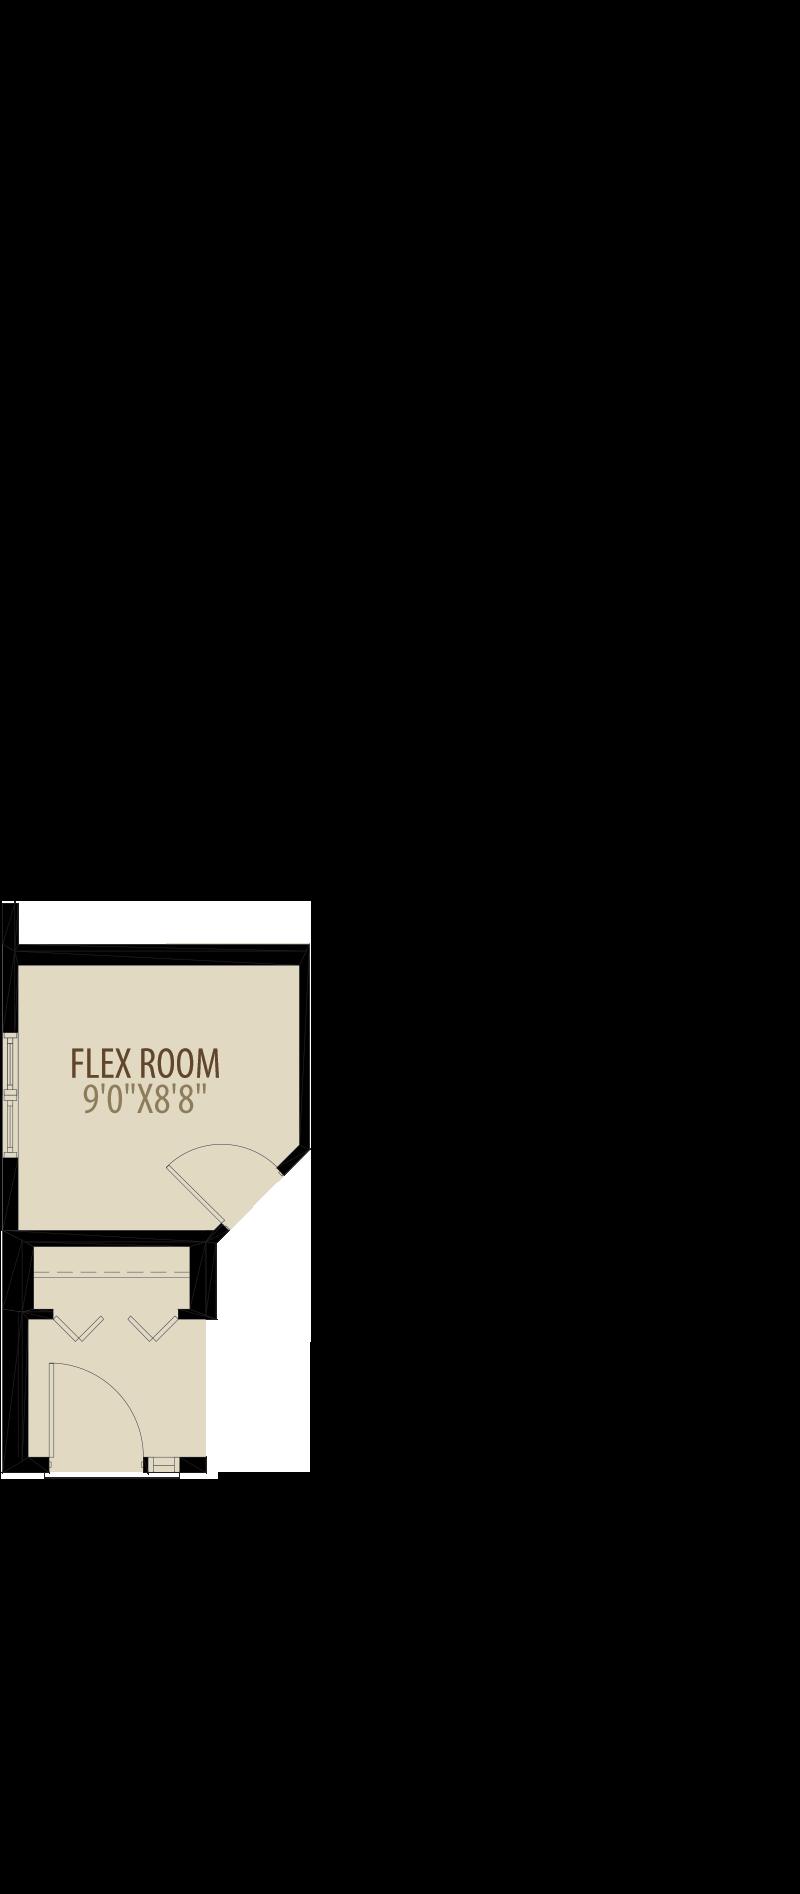 Option 5 Enclosed Flex Room